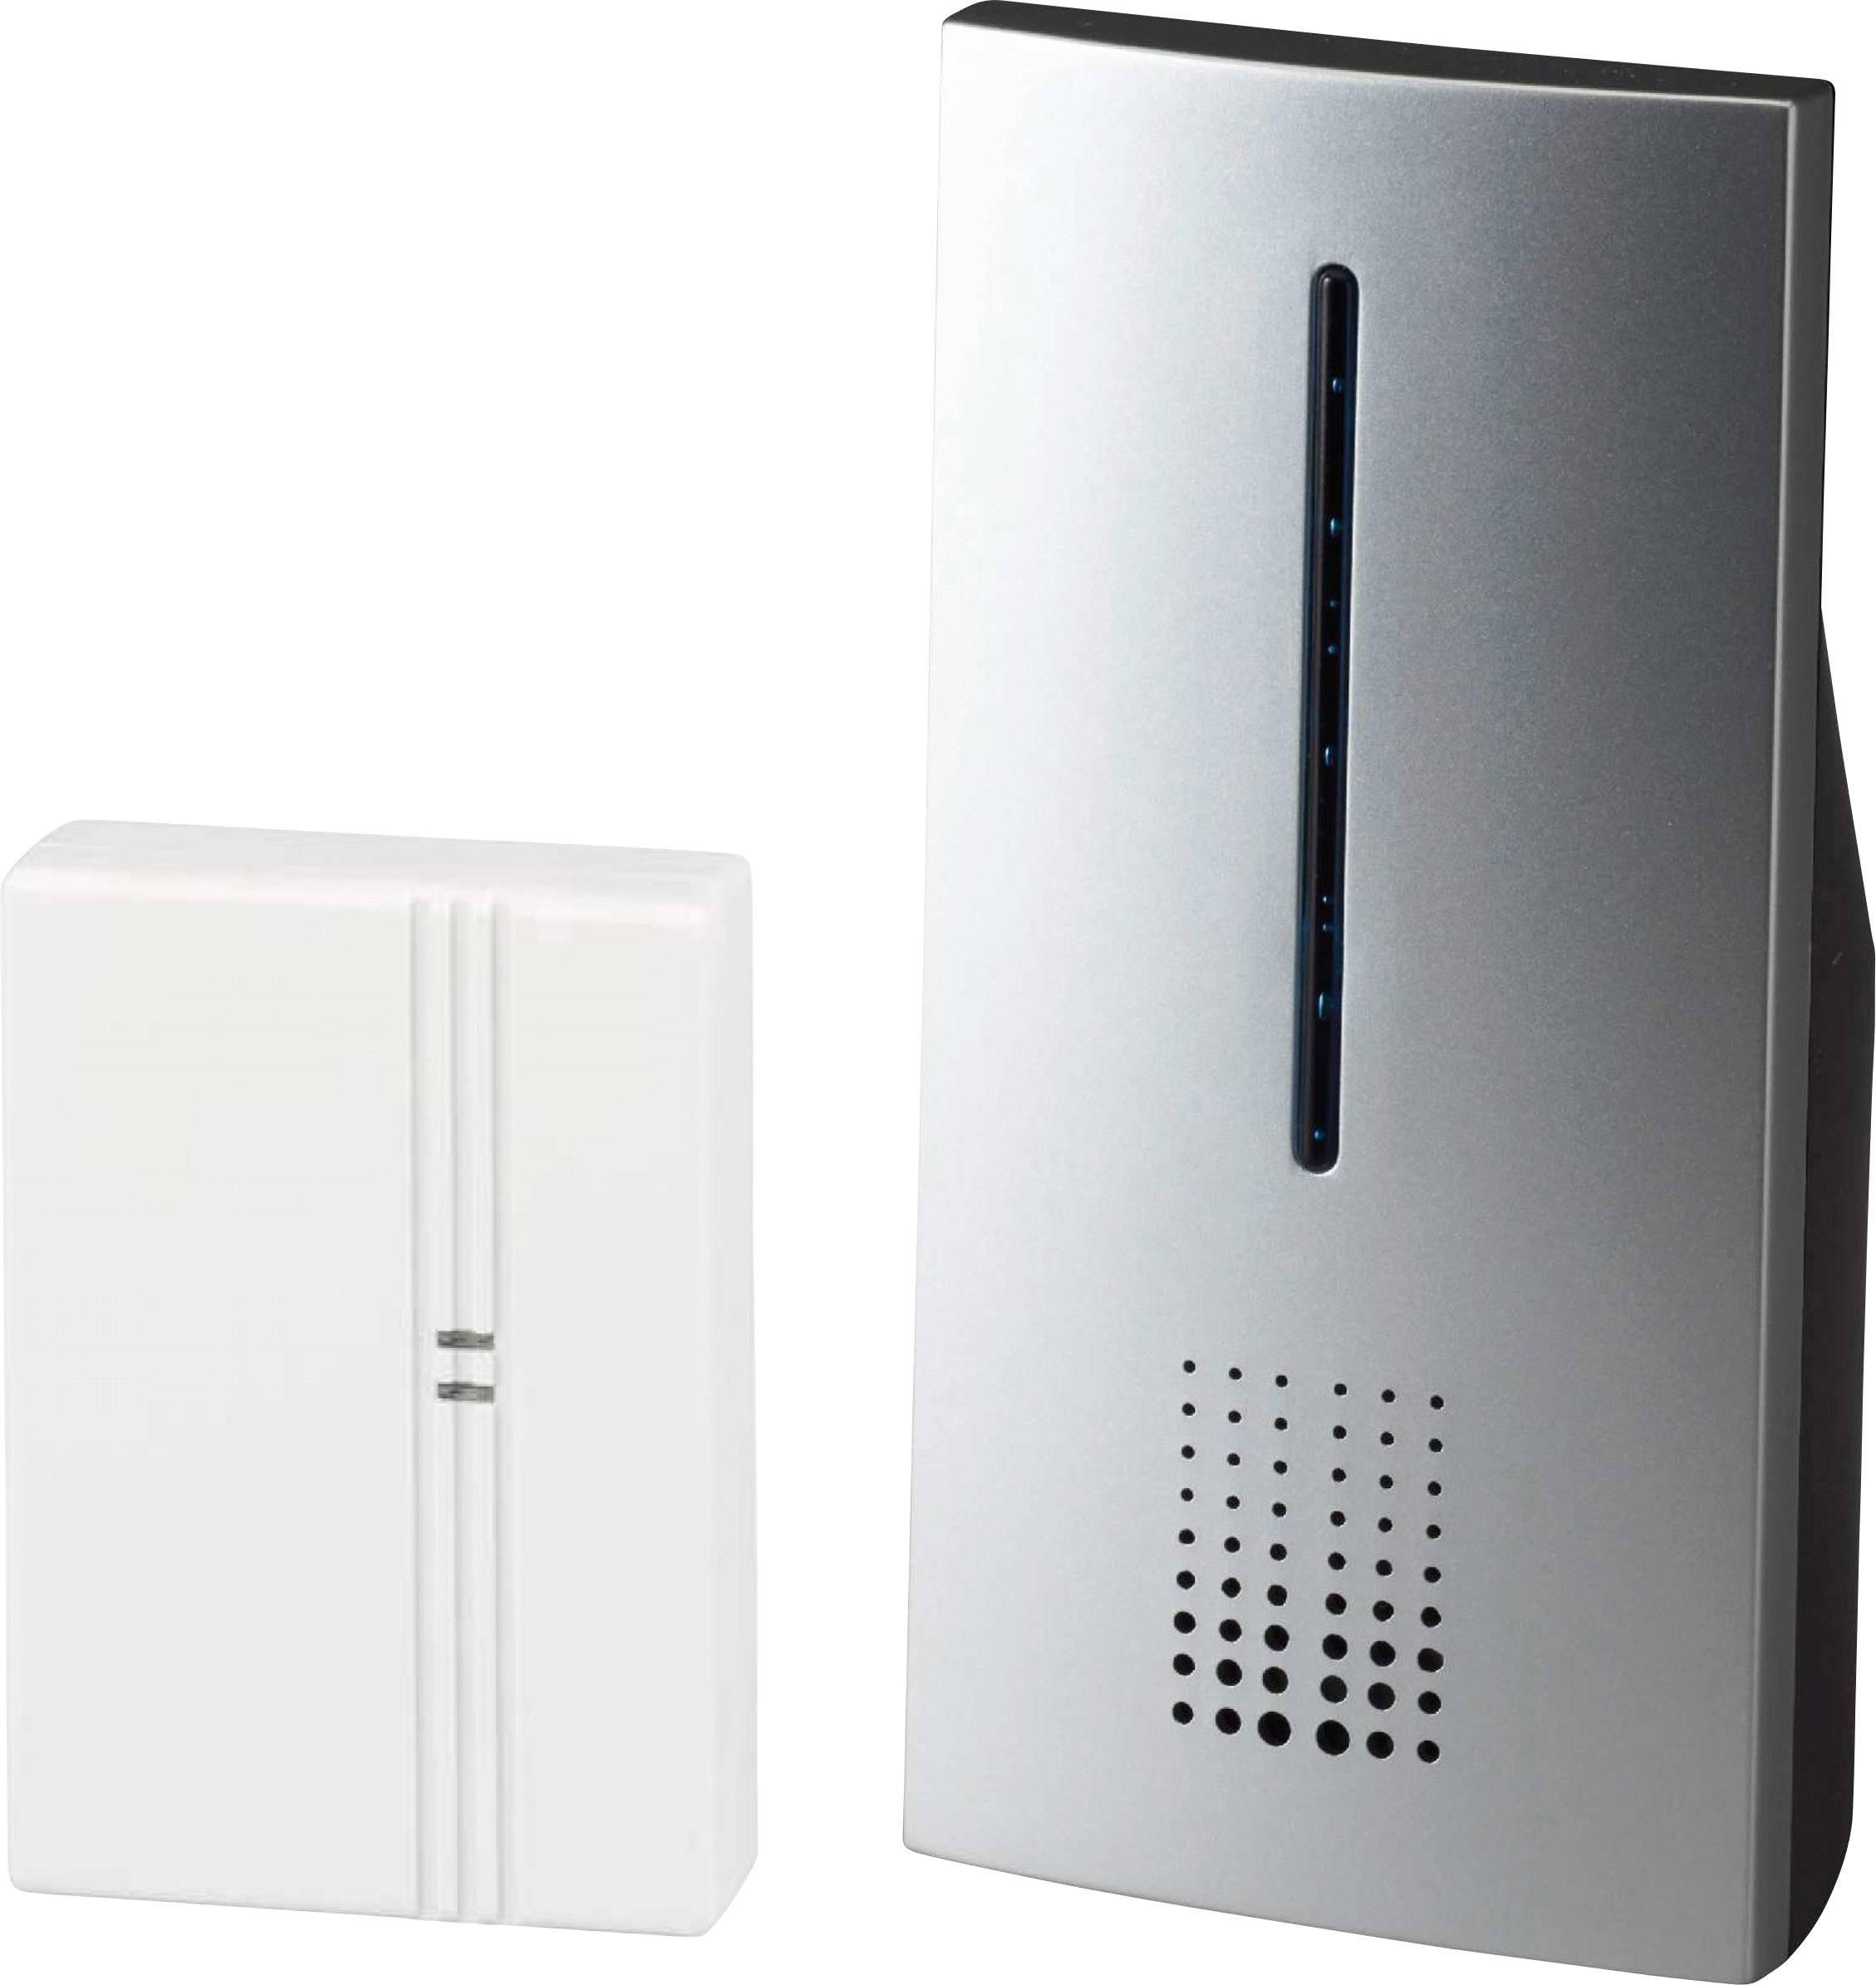 Heidemann Funk Distanzerweiterung HX 70376 Funkgong Funkklingel Sender Empfänger